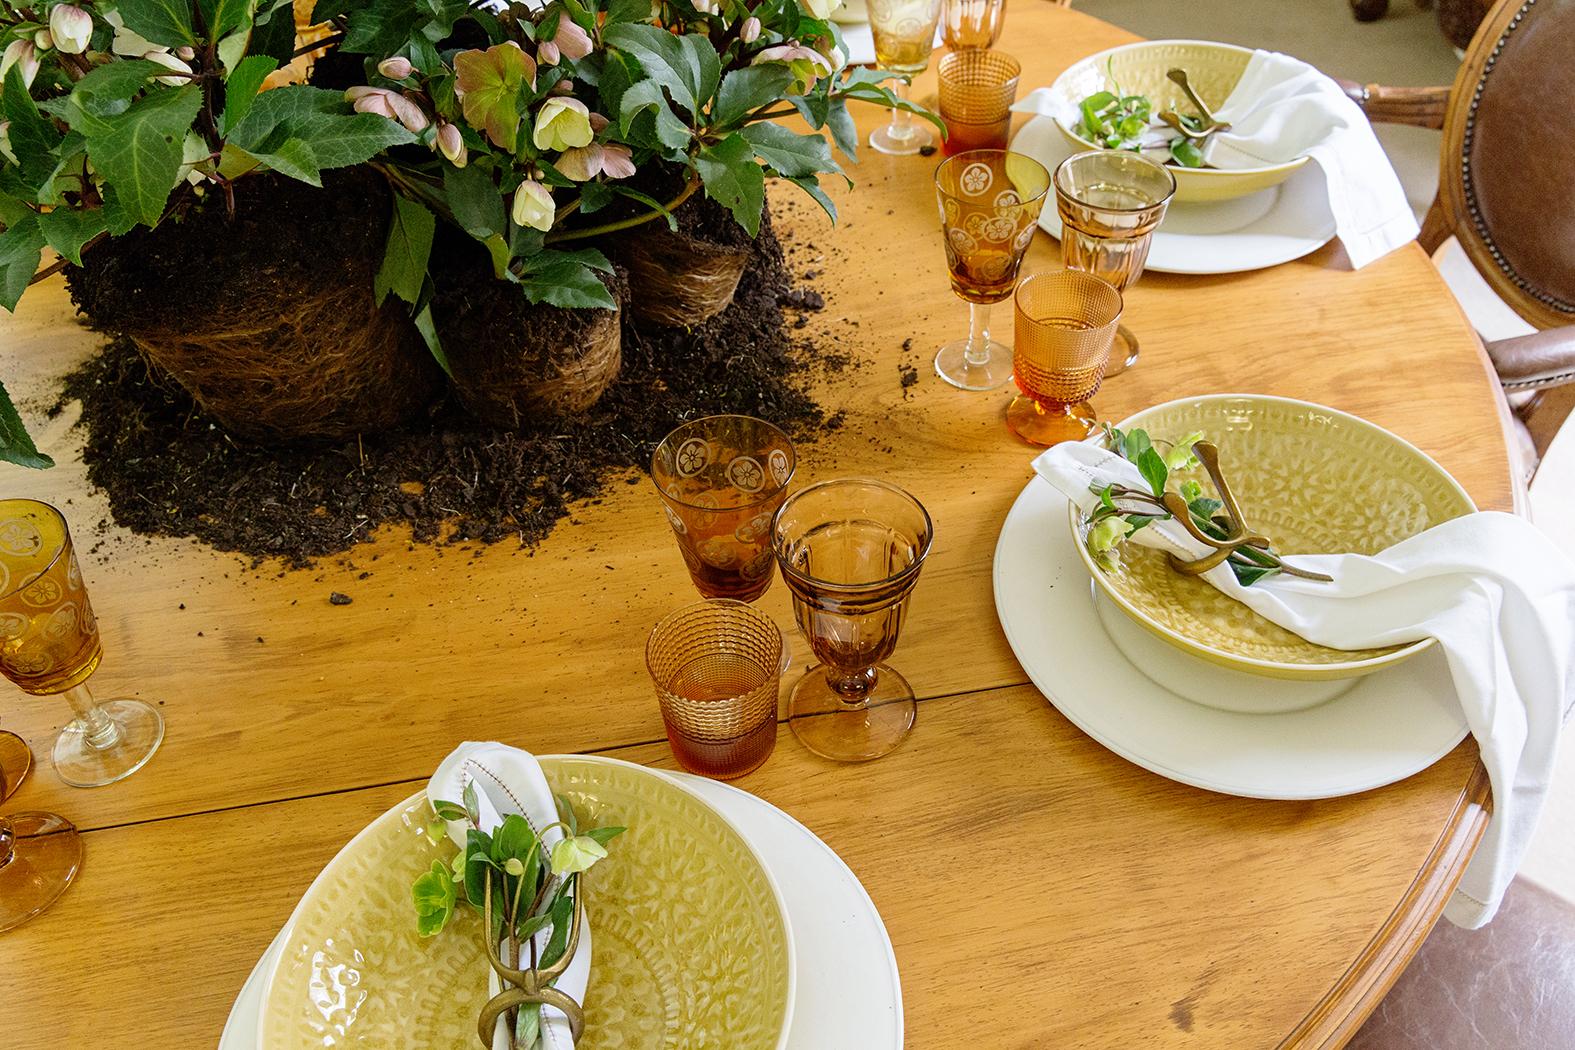 Floral Table Duck 027.jpg